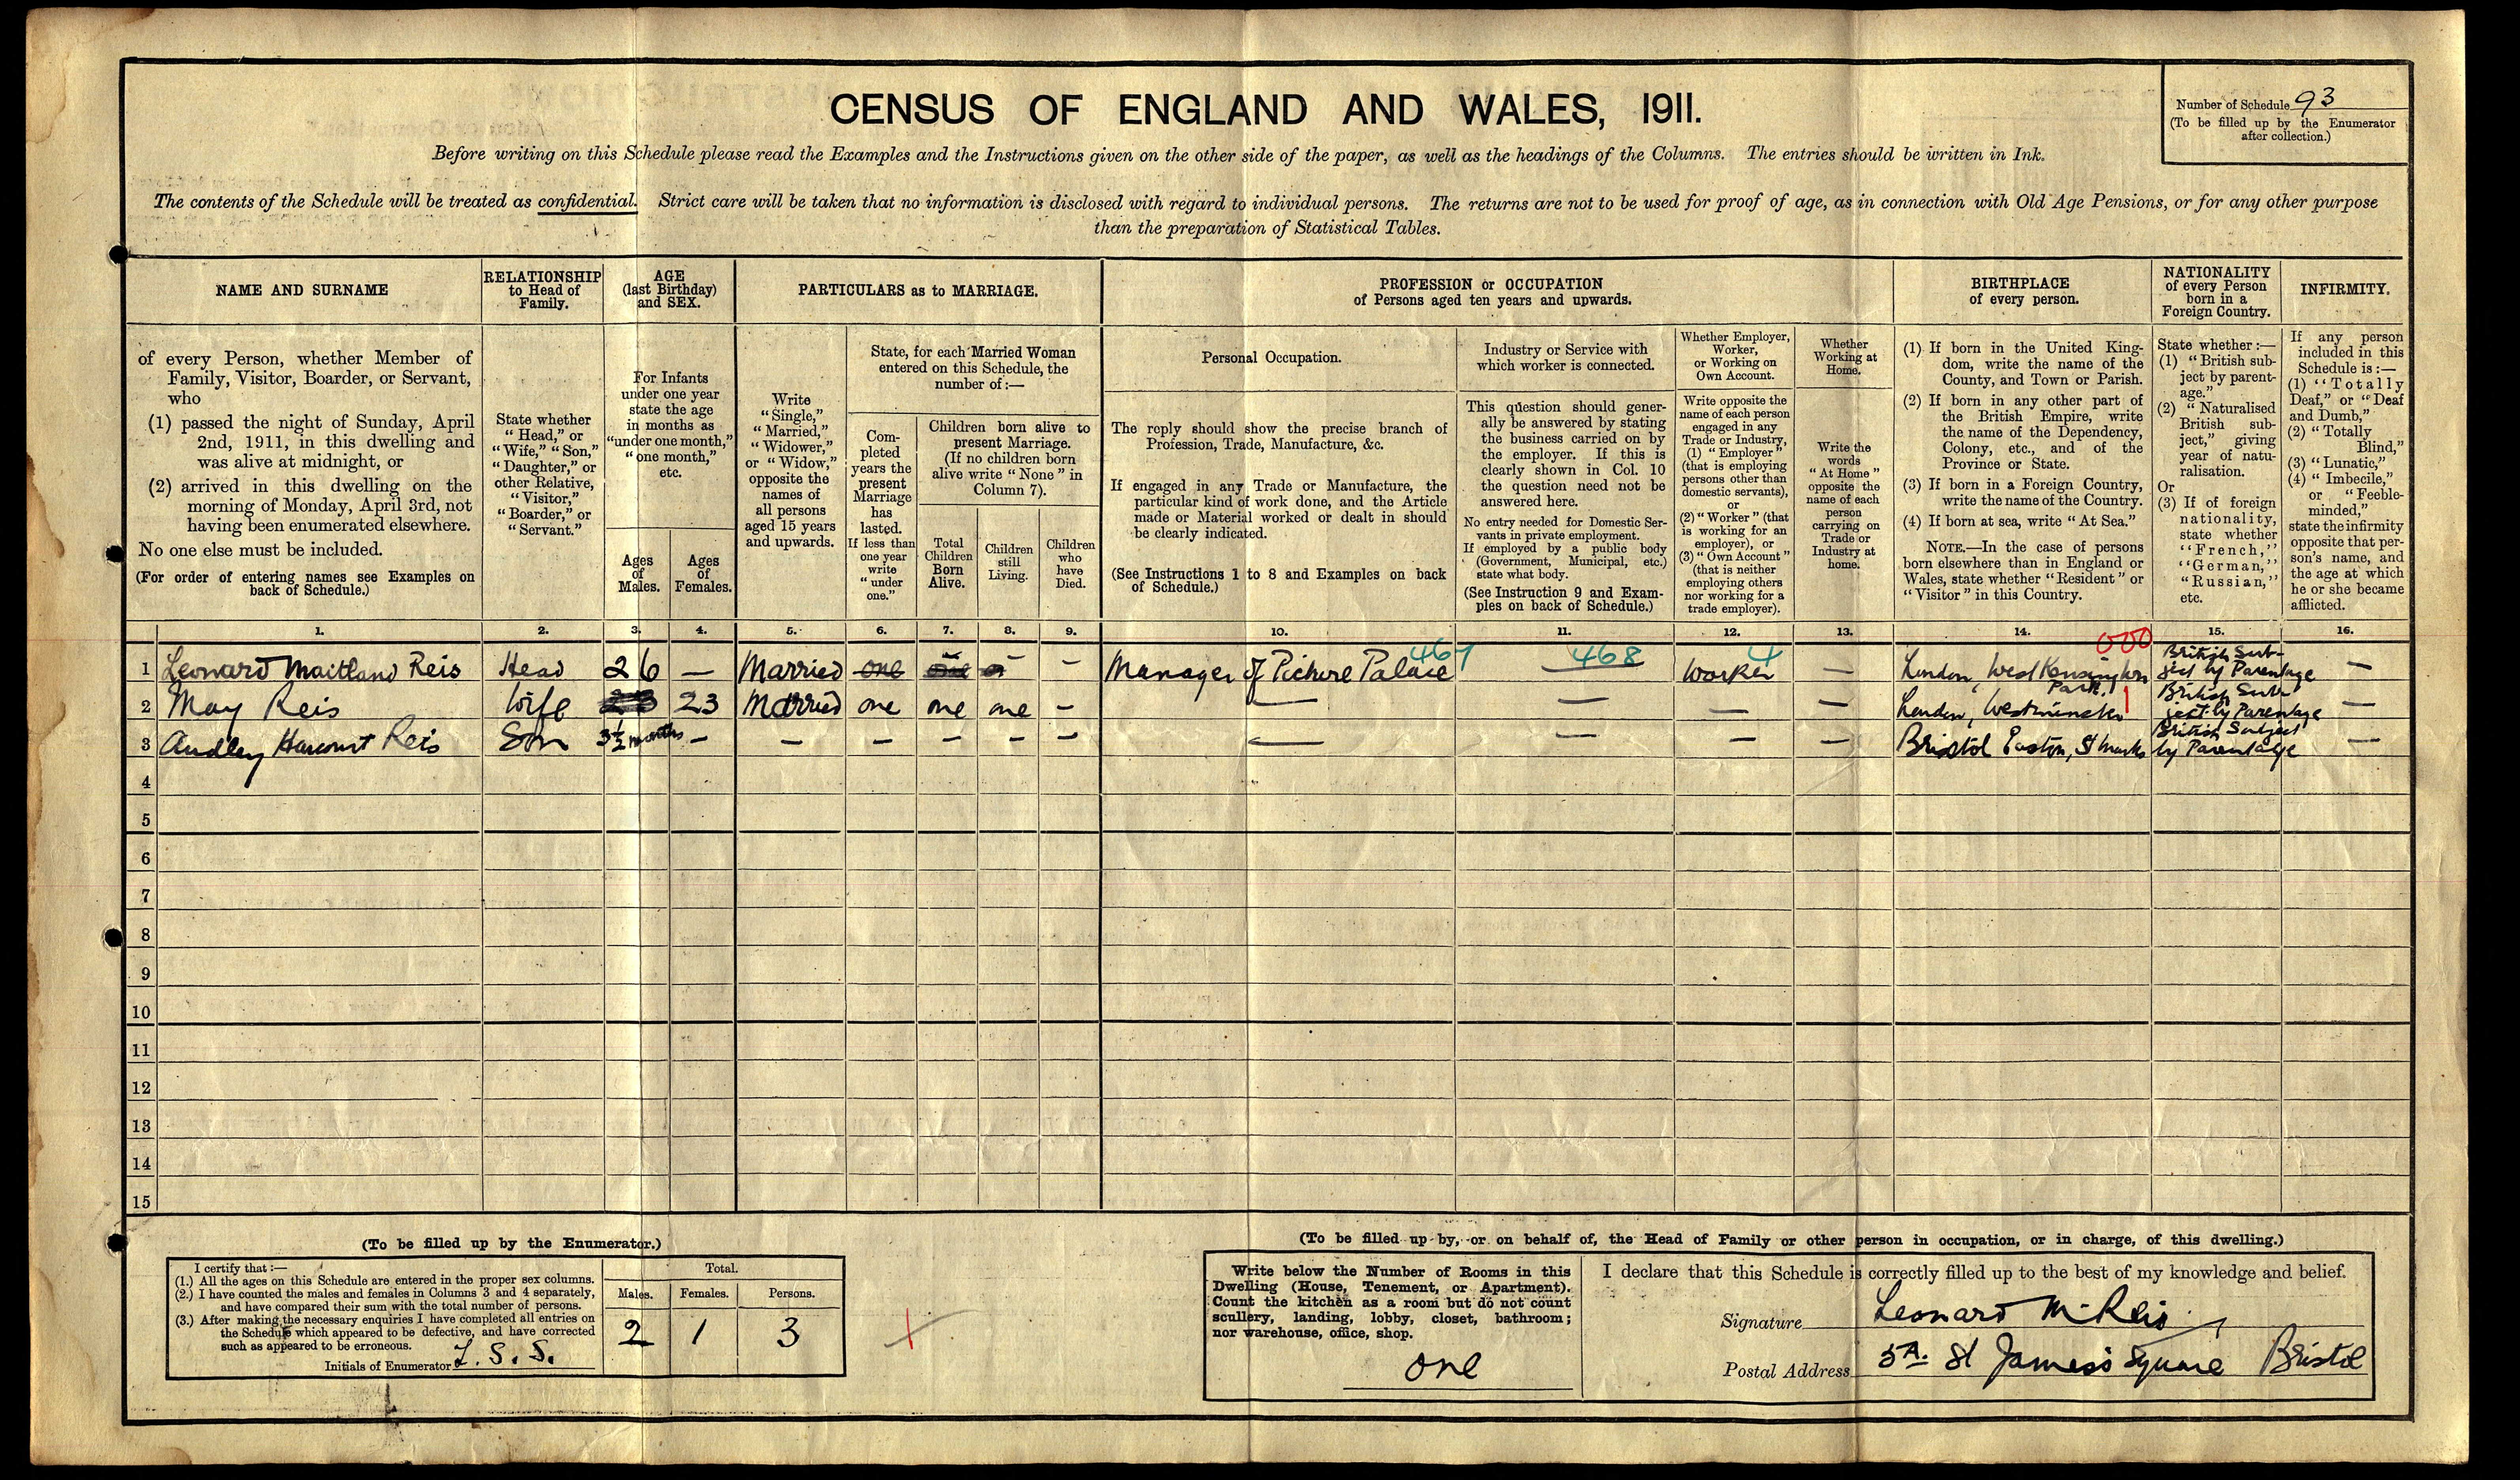 Leonard Maitland Reis 1911 census